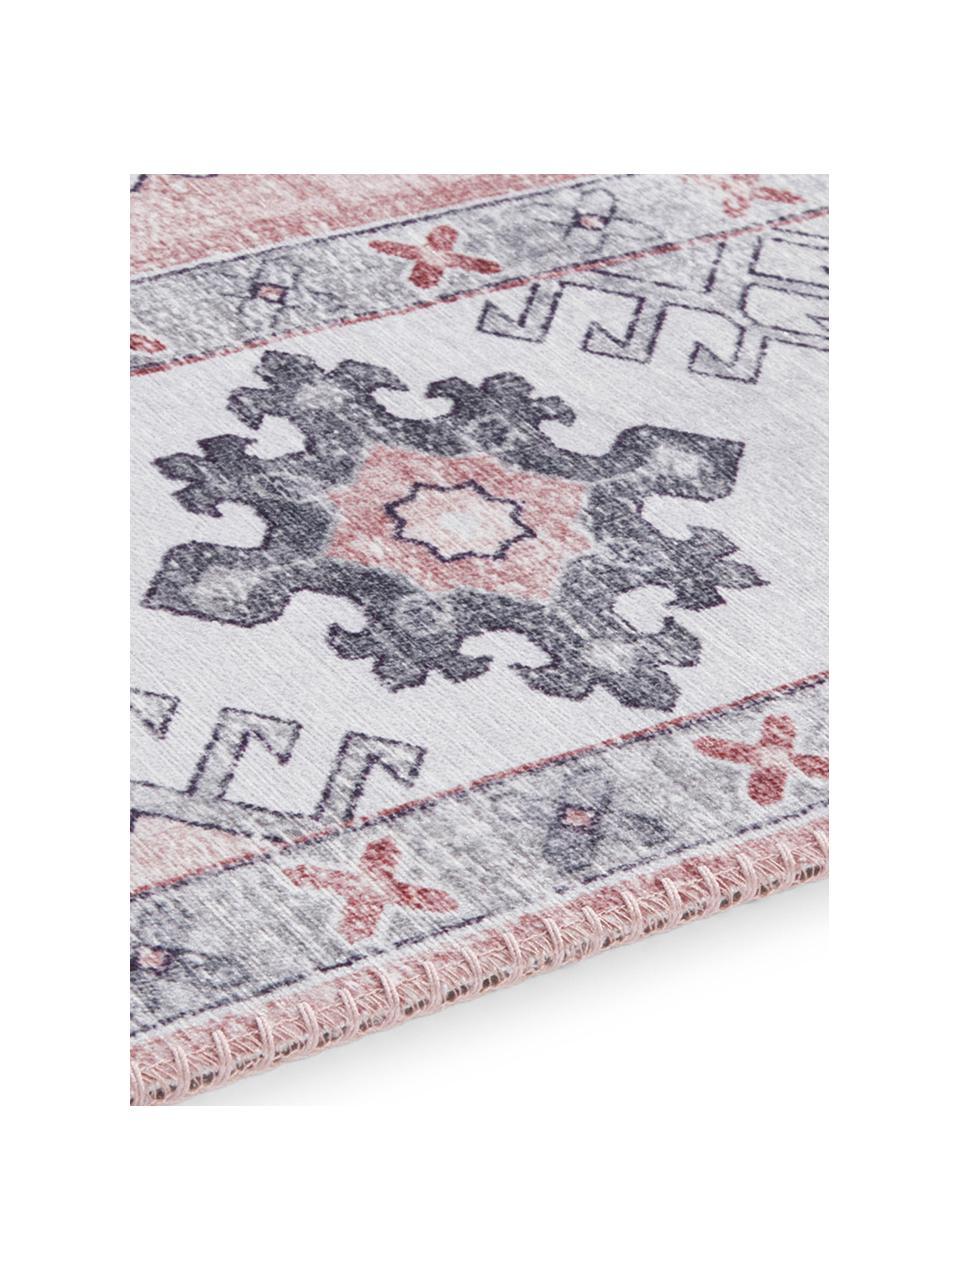 Läufer Gratia im Vintage Style, 100% Polyester, Altrosa, Grau, 80 x 200 cm